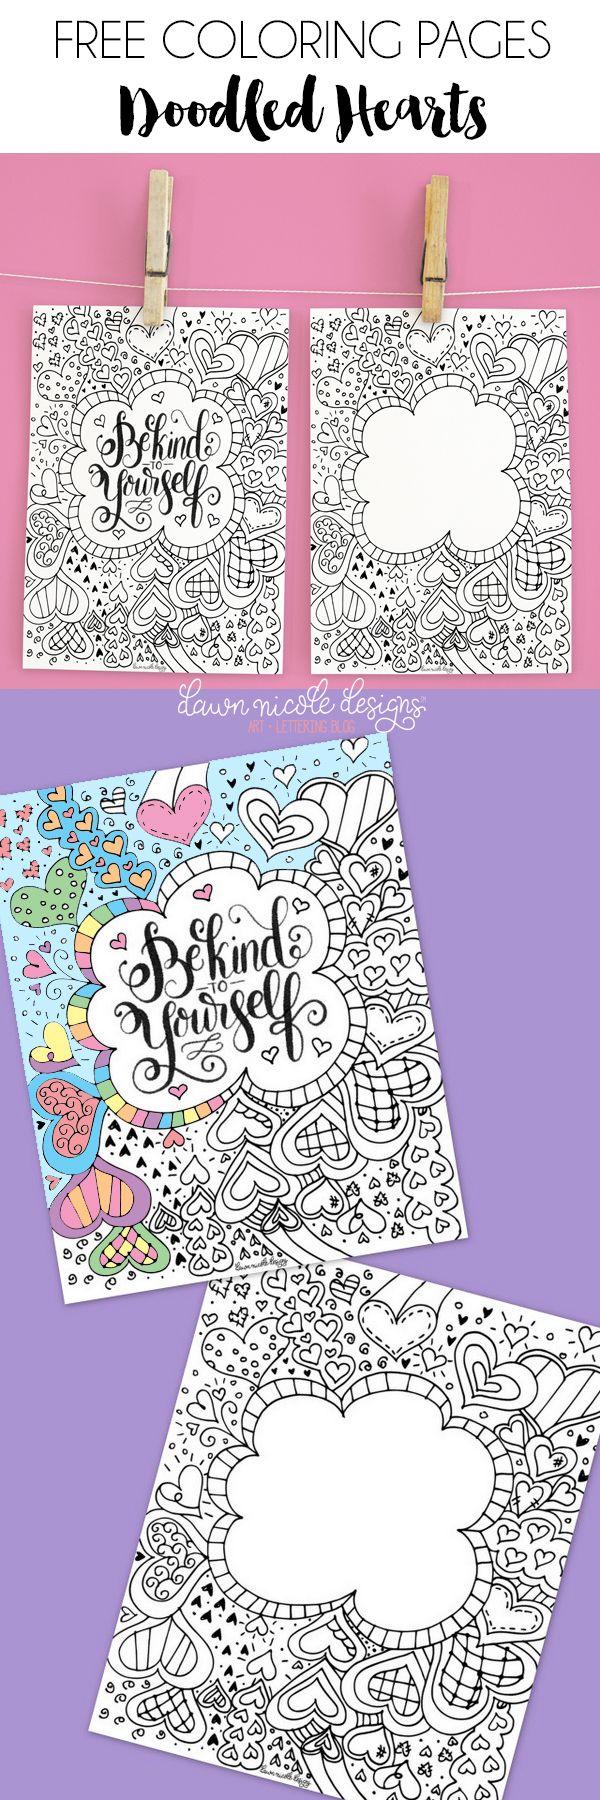 Doodled Hearts Free Coloring Pages | Mandalas, Colorear y Dibujo